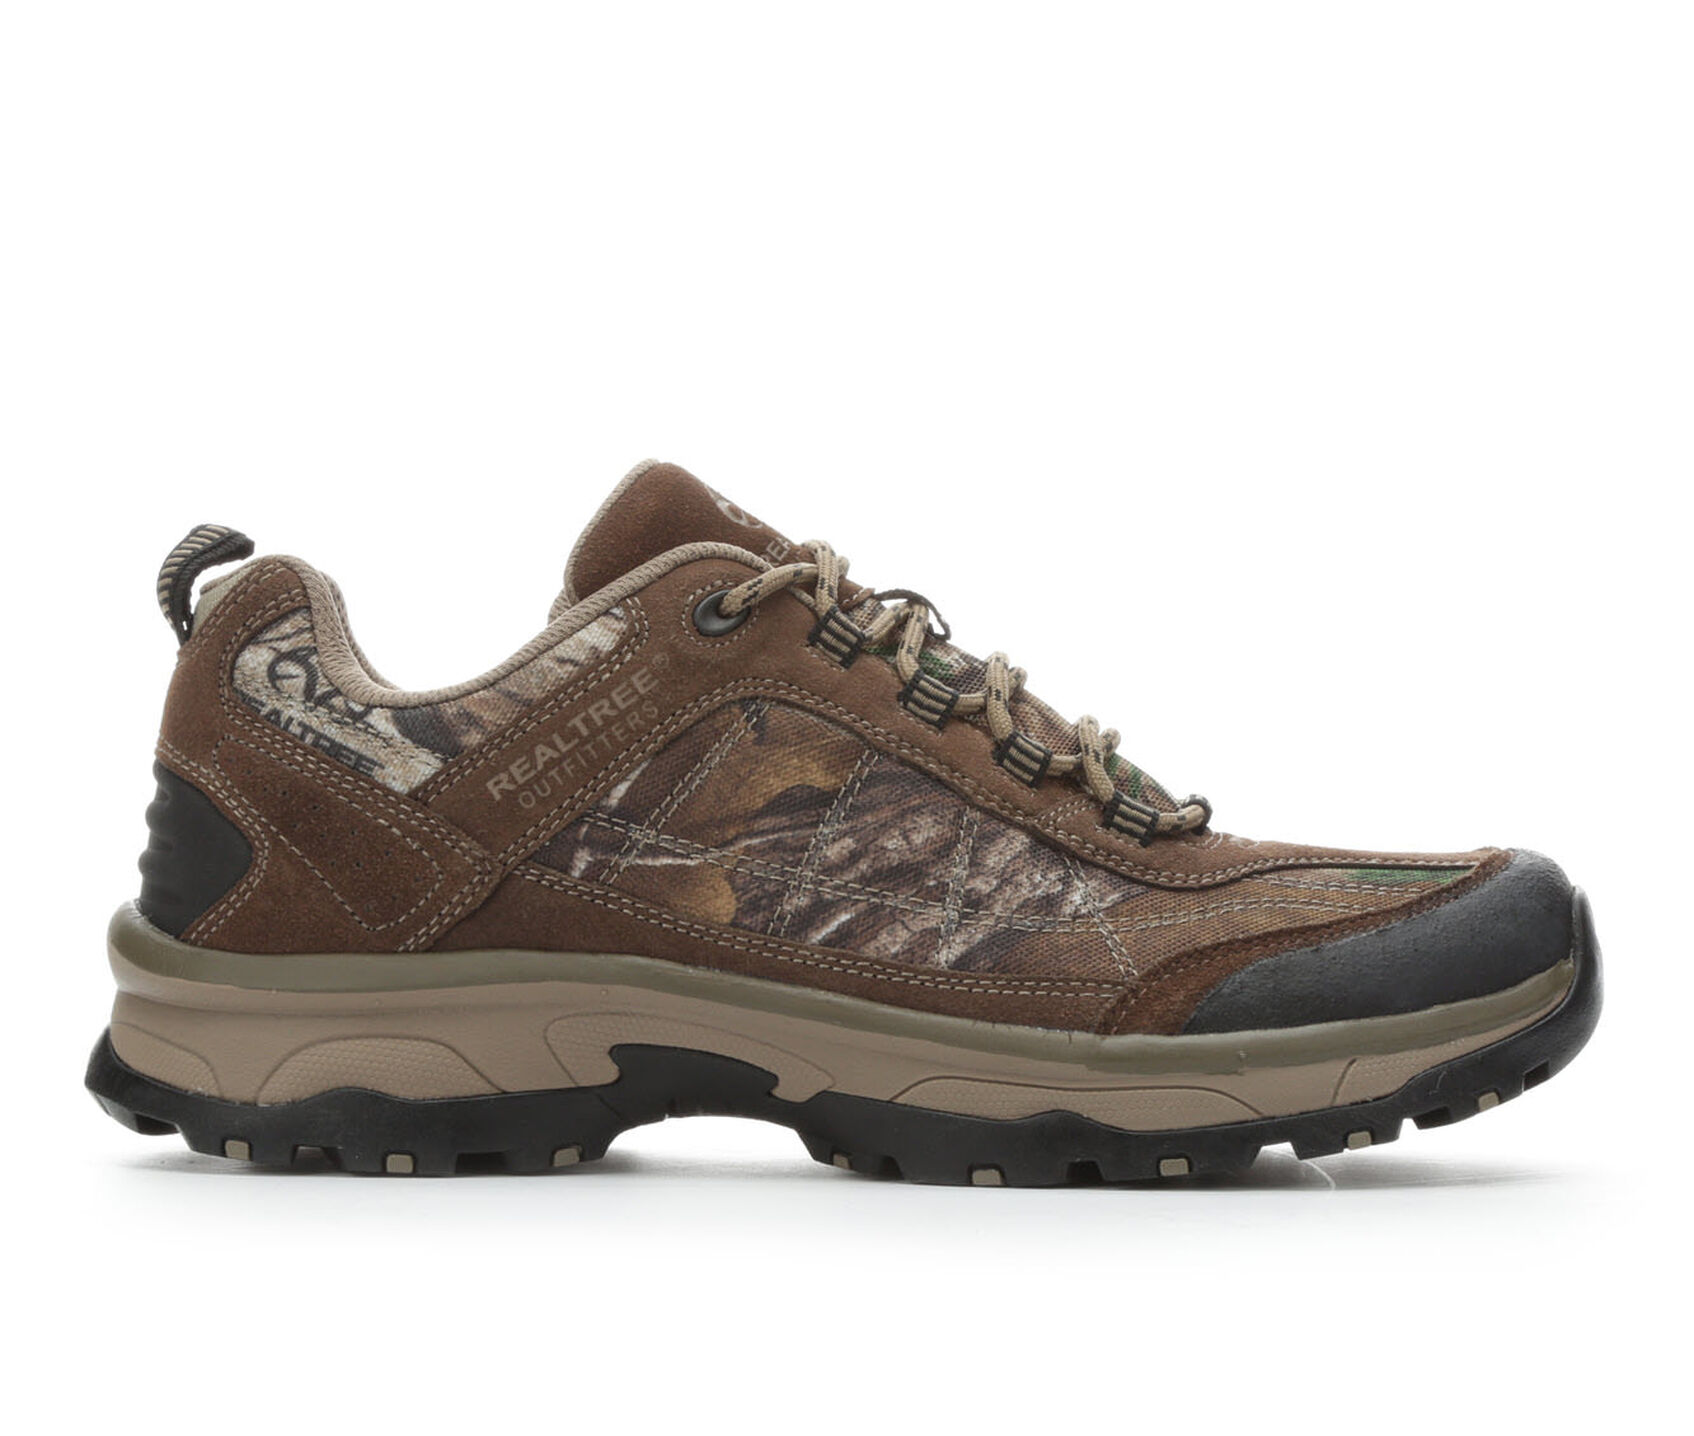 Realtree Running Shoes